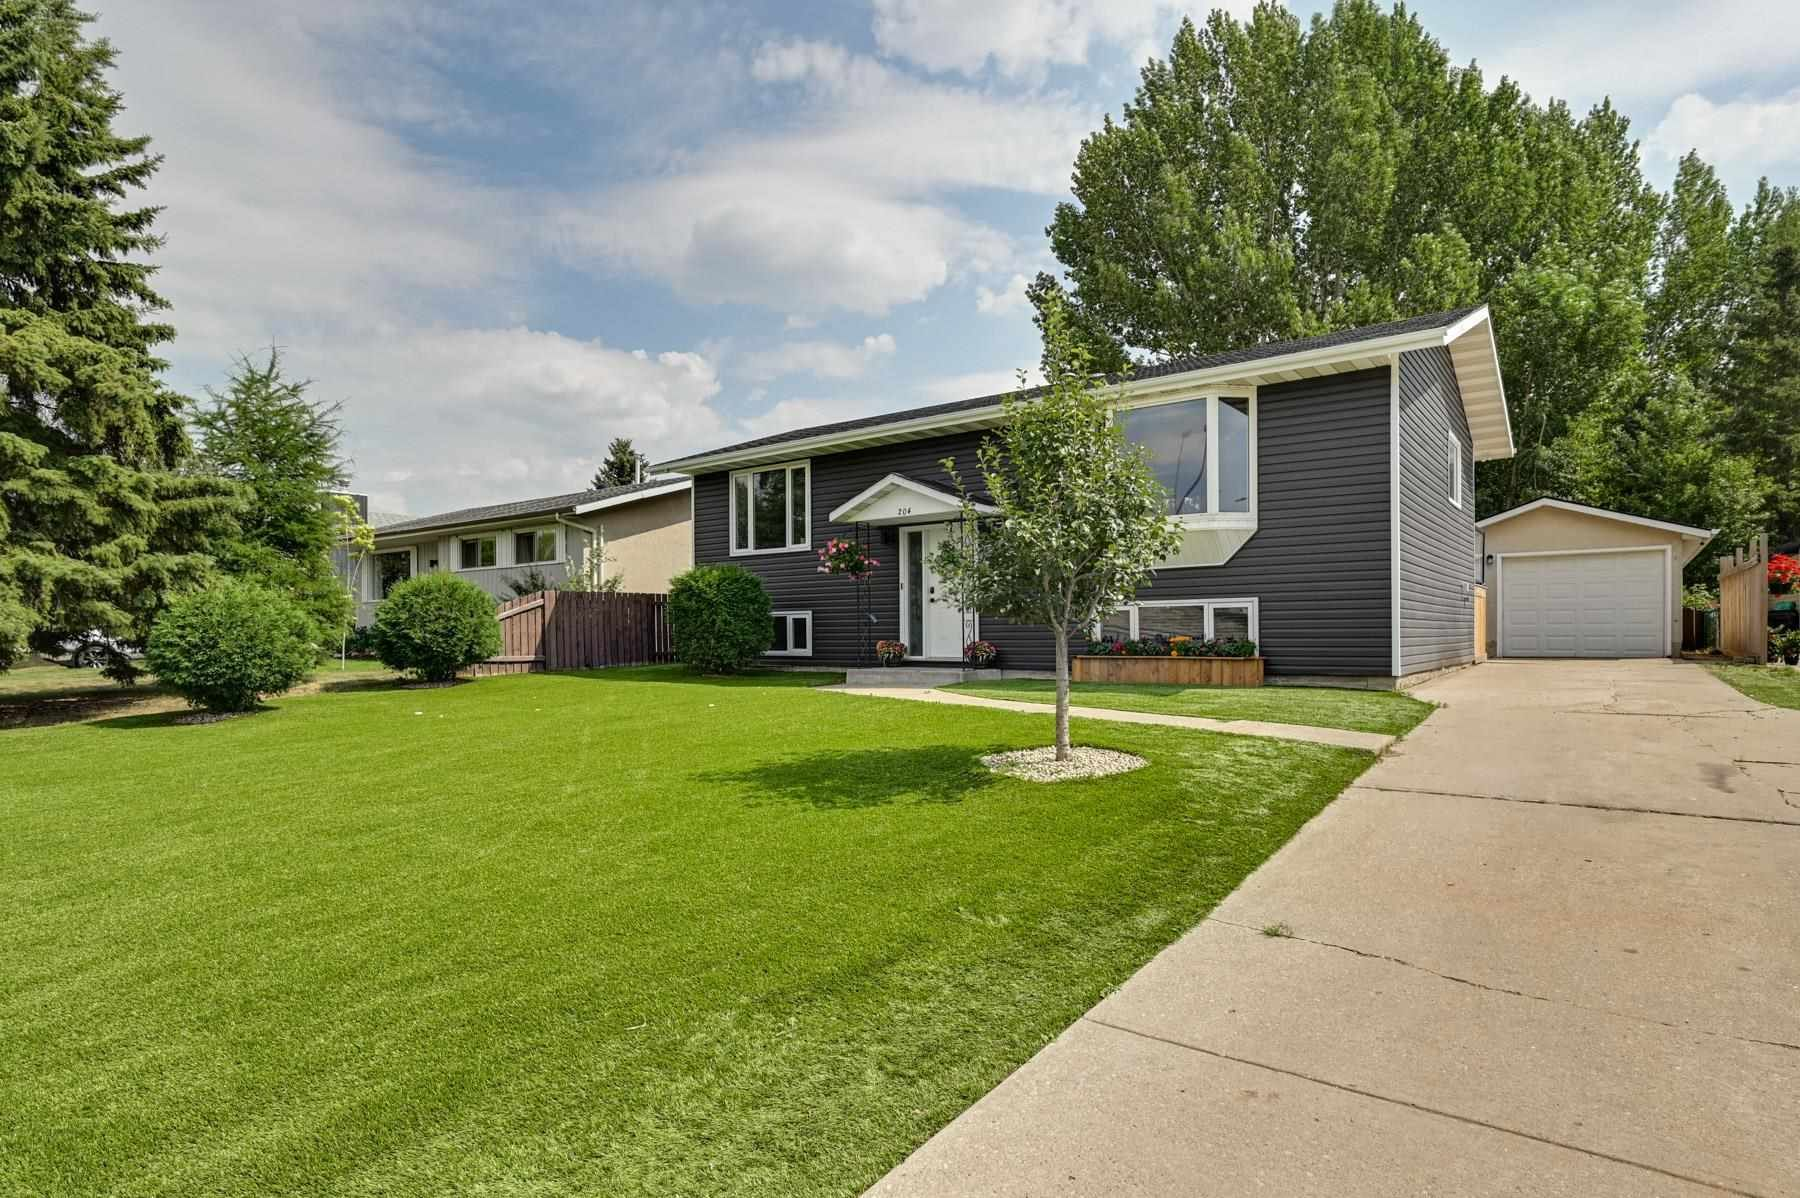 Main Photo: 204 GEORGIAN Way: Sherwood Park House for sale : MLS®# E4257975